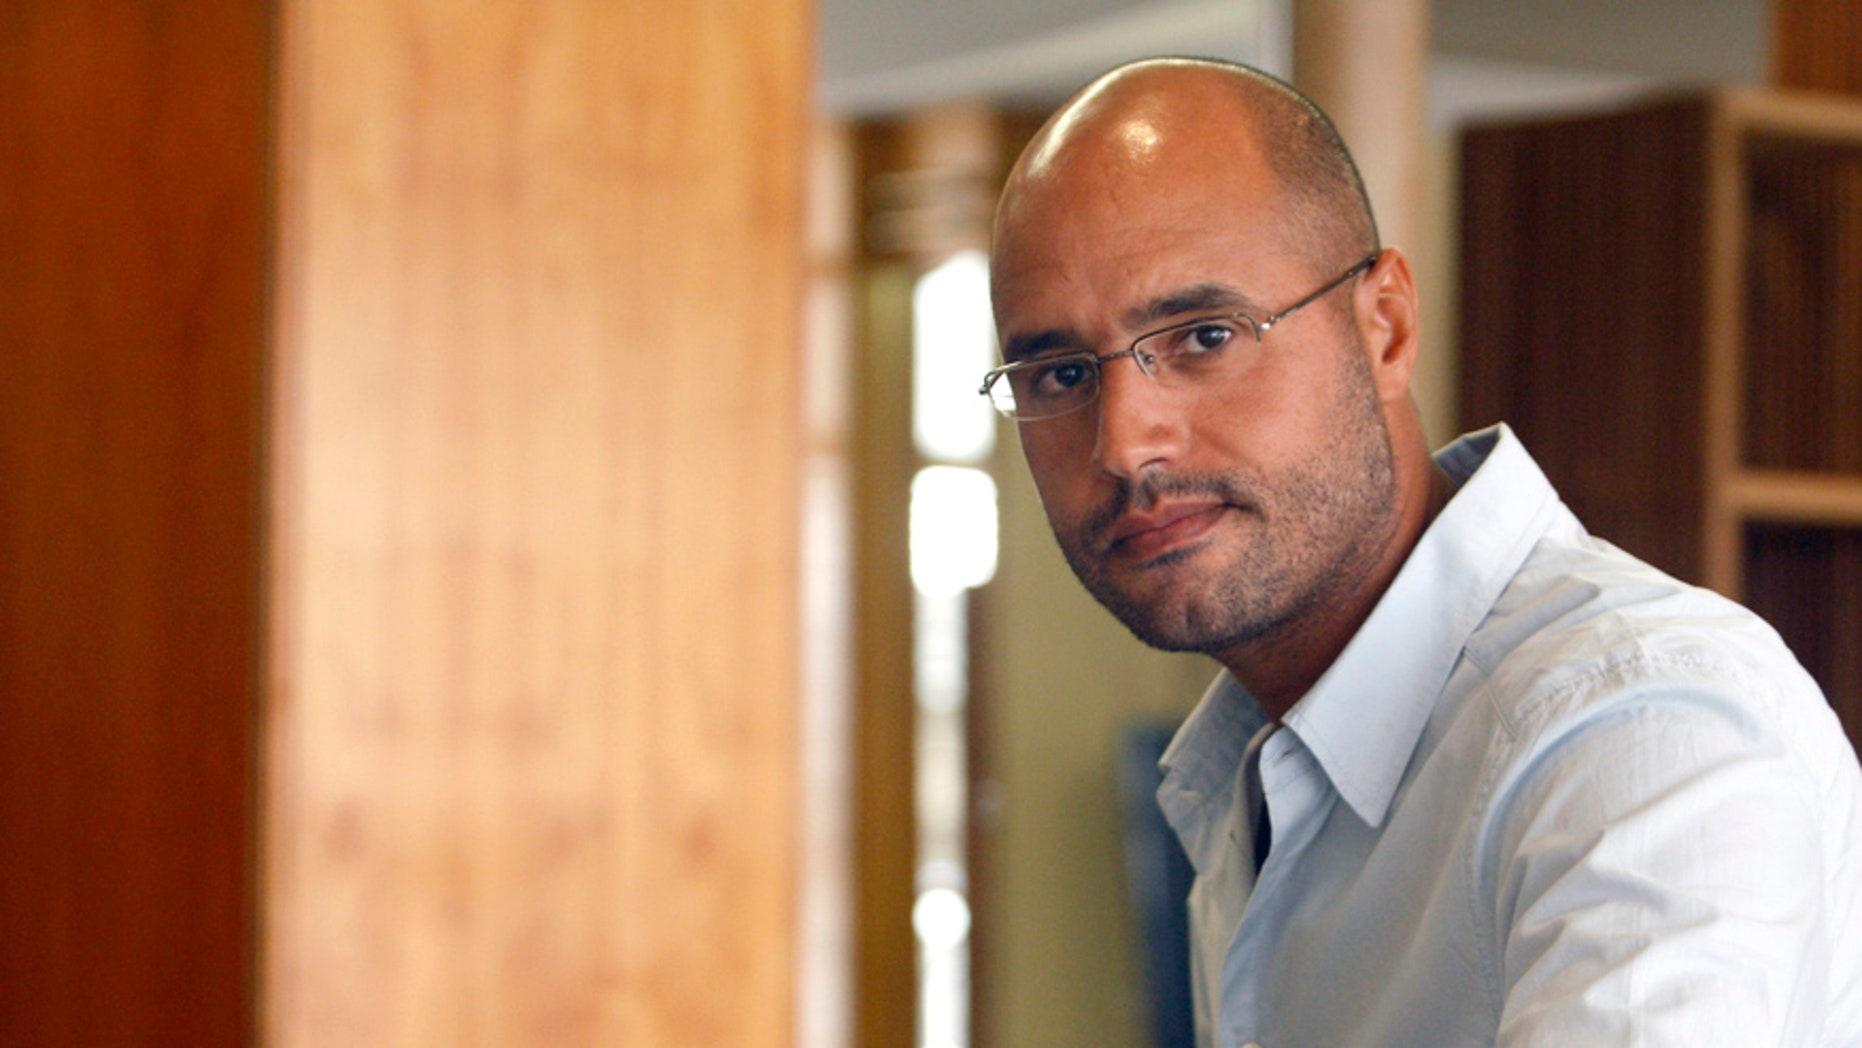 Seif al-Islam, son of ex-Libyan dictator Muammar Qaddafi.